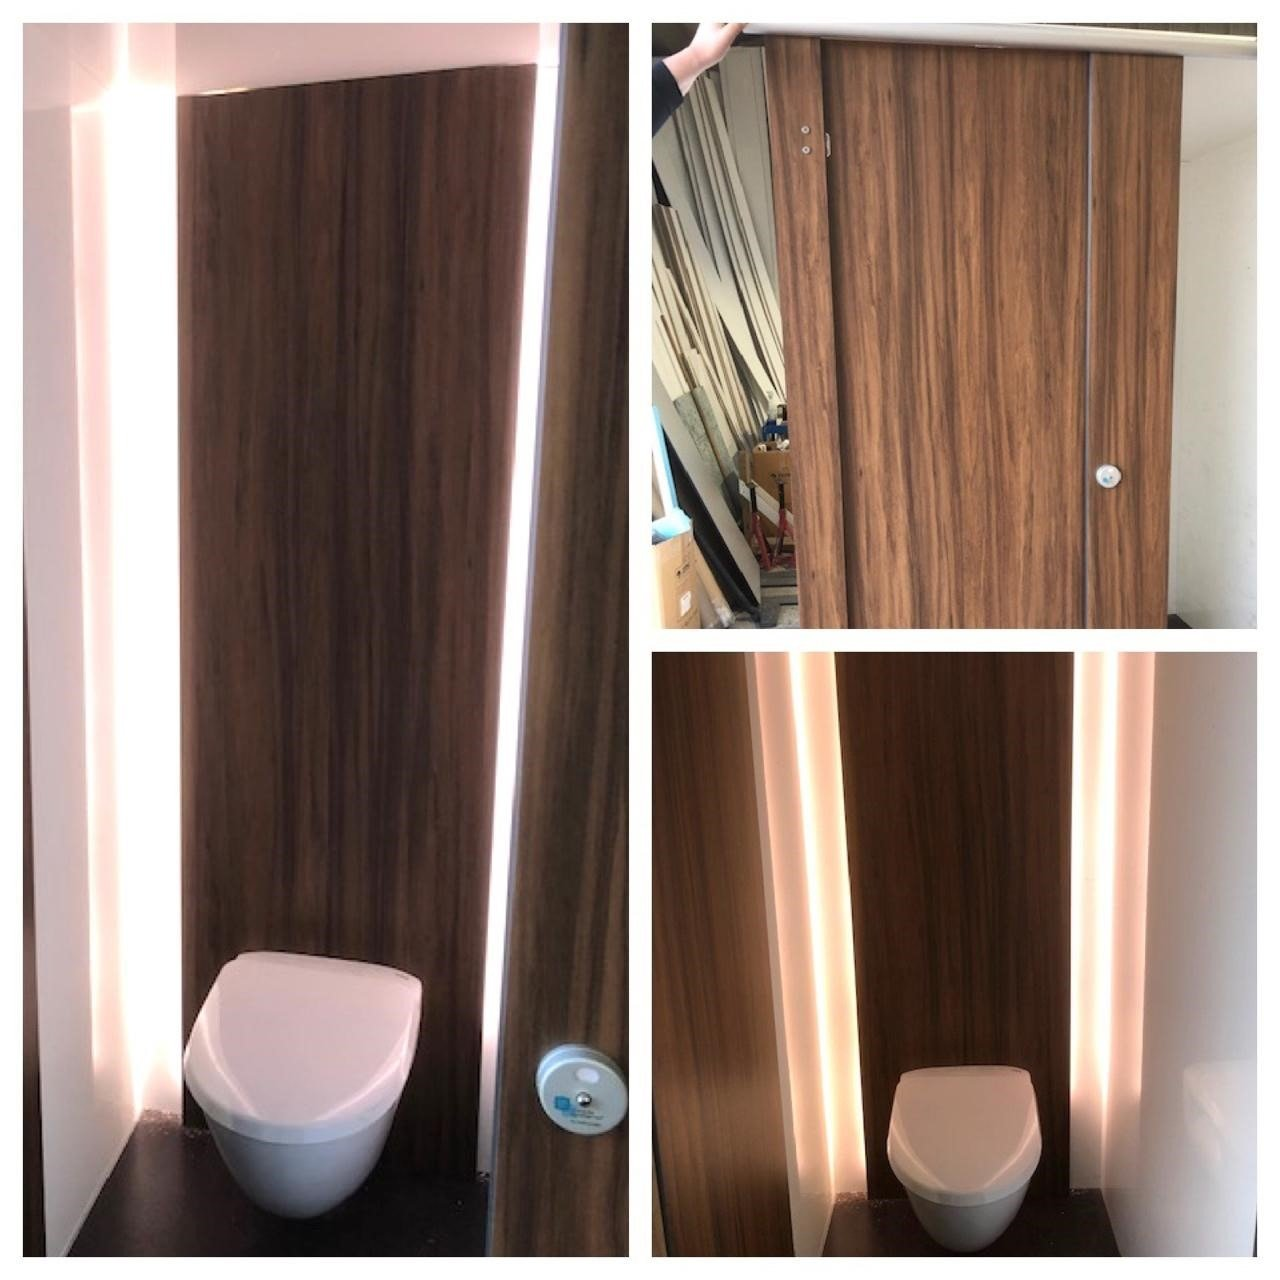 Product Development Luxury Toilet Tent Hire Renal Service